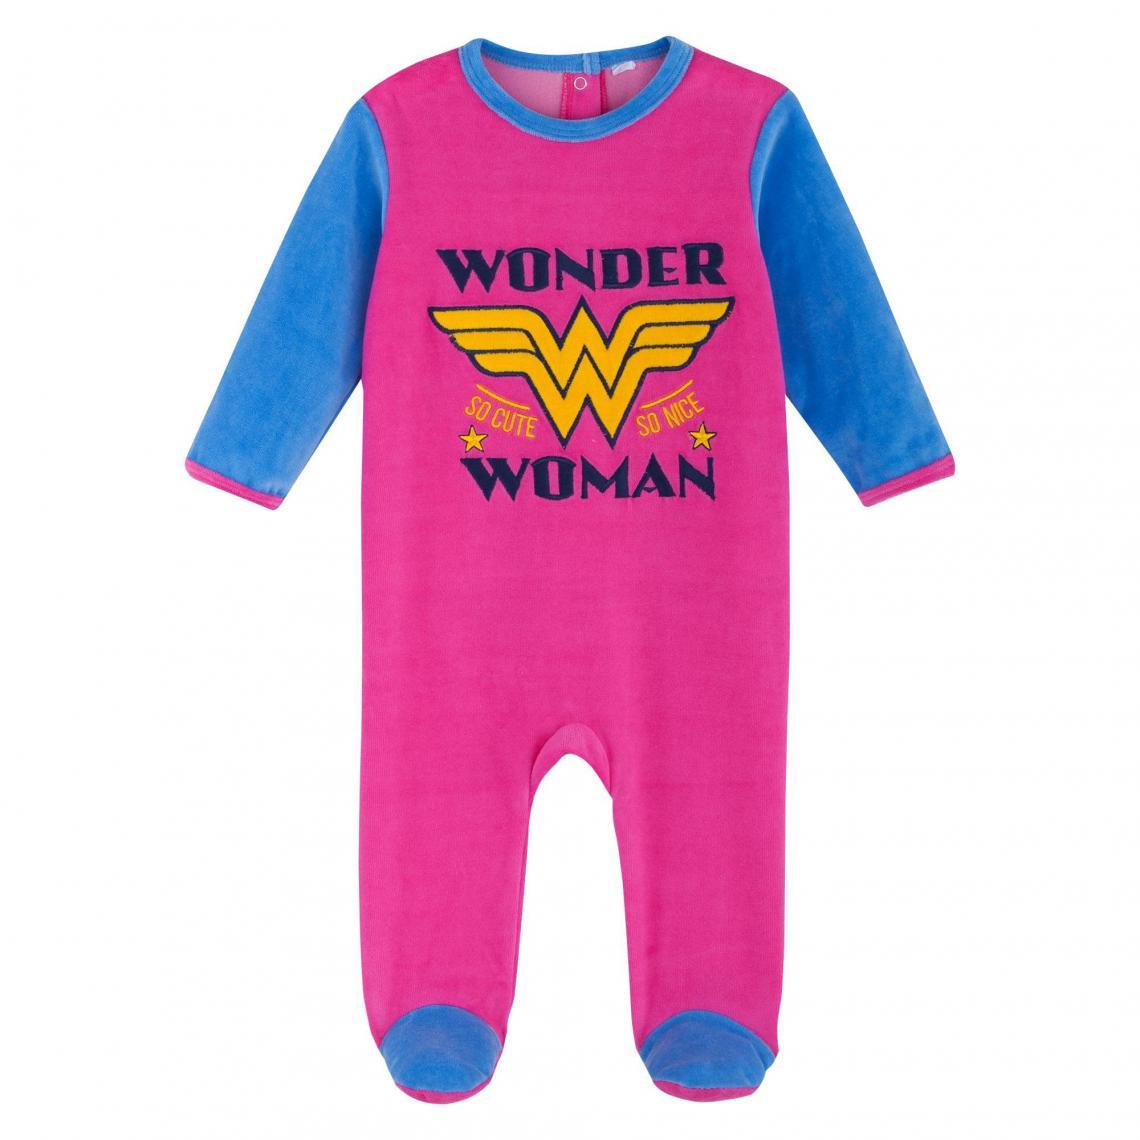 Dors-bien velours brod� b�b� fille Wonder Woman - Rose - 3Suisses